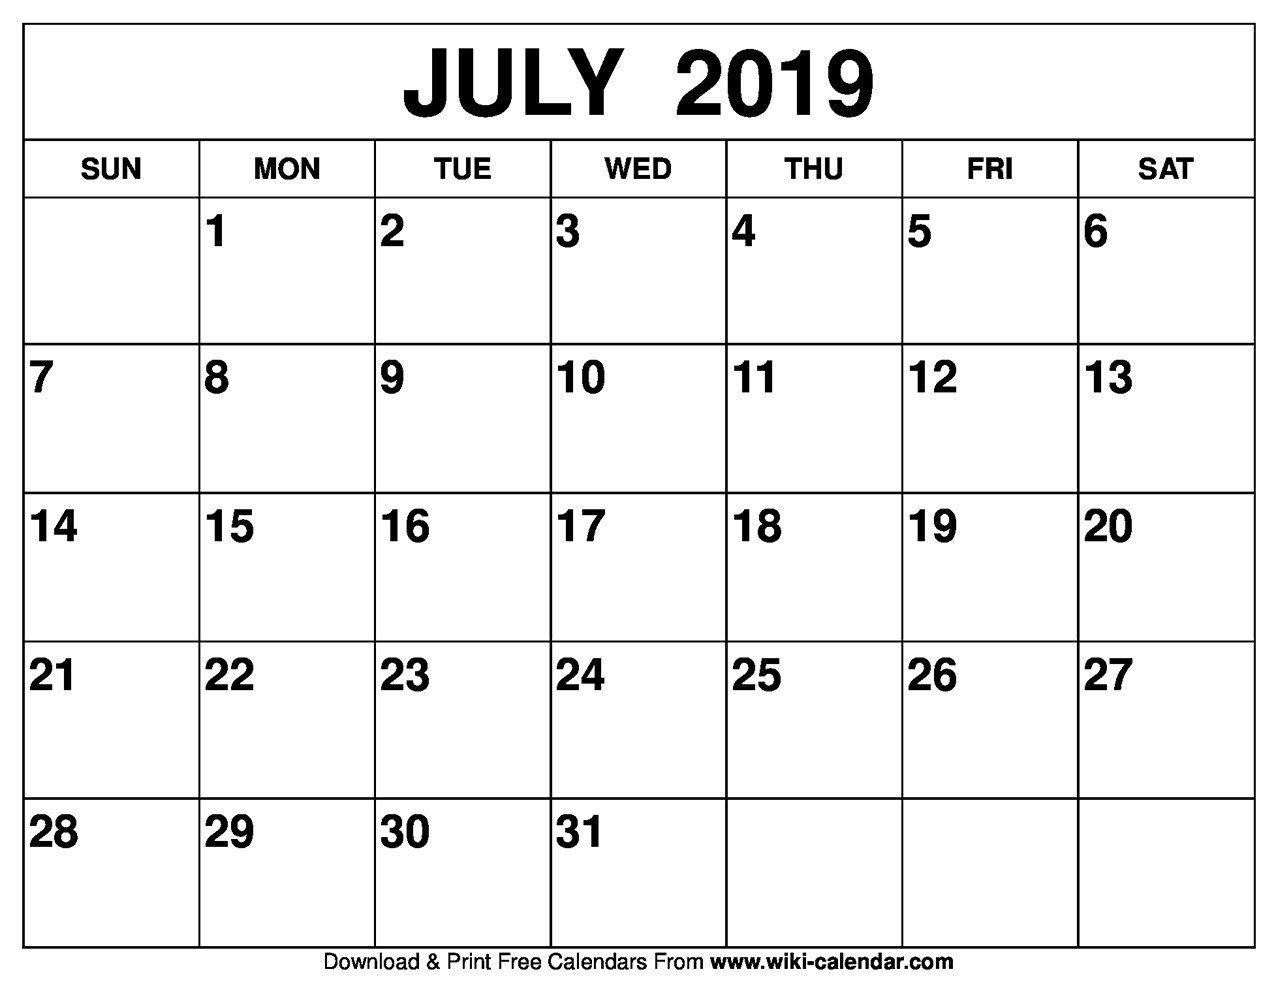 July 2019 Calendar - Sharon Gore - Medium July 1 2019 Calendar